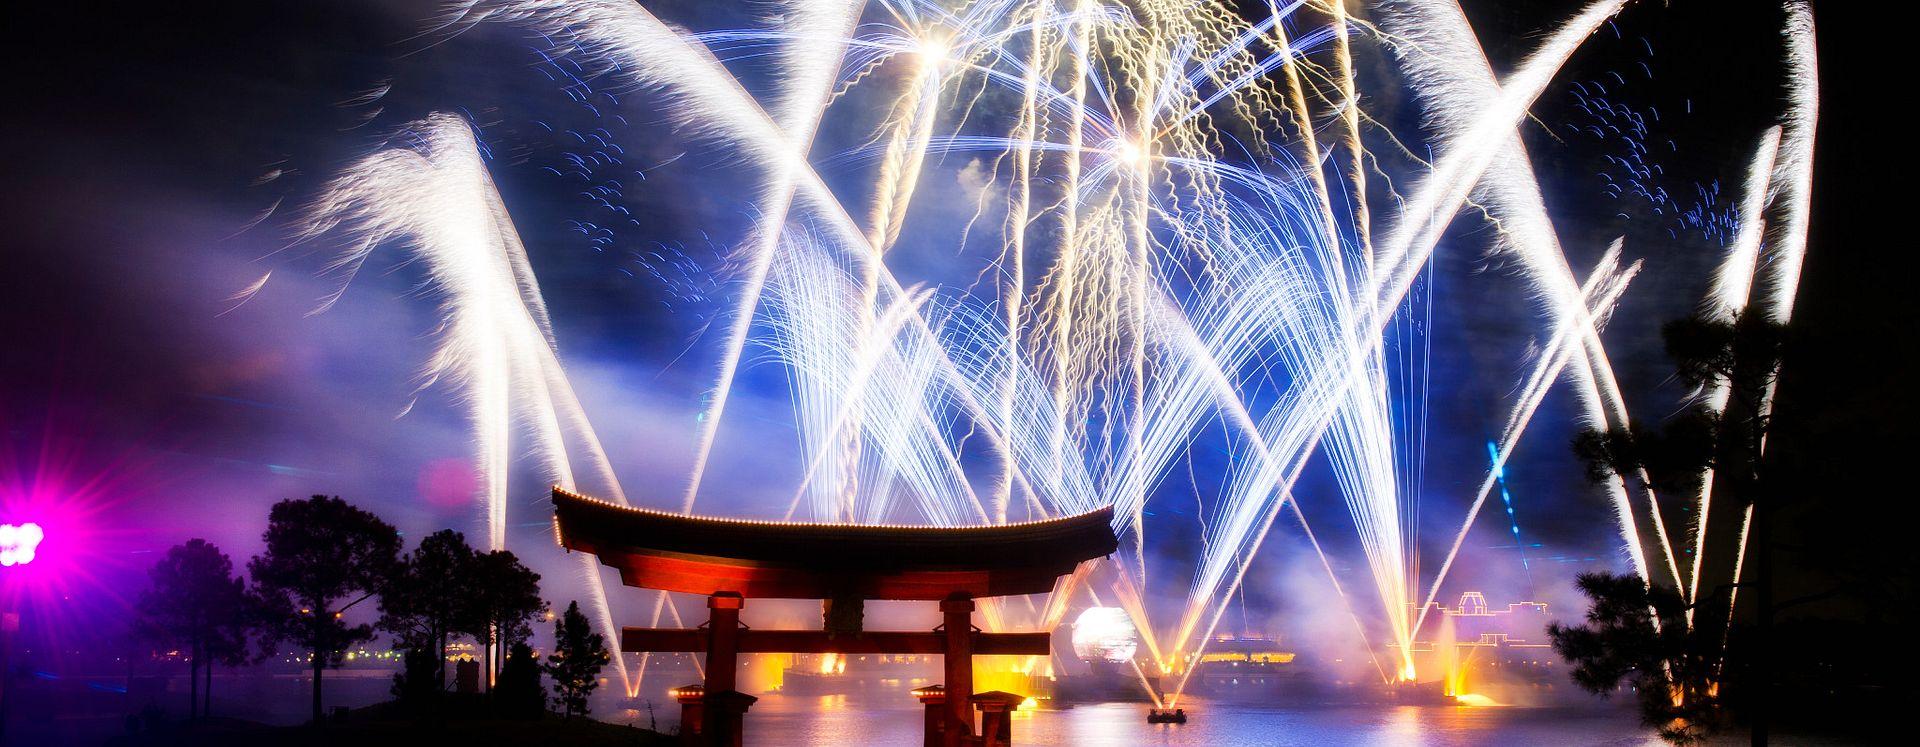 Walt Disney World's Illuminations Fireworks